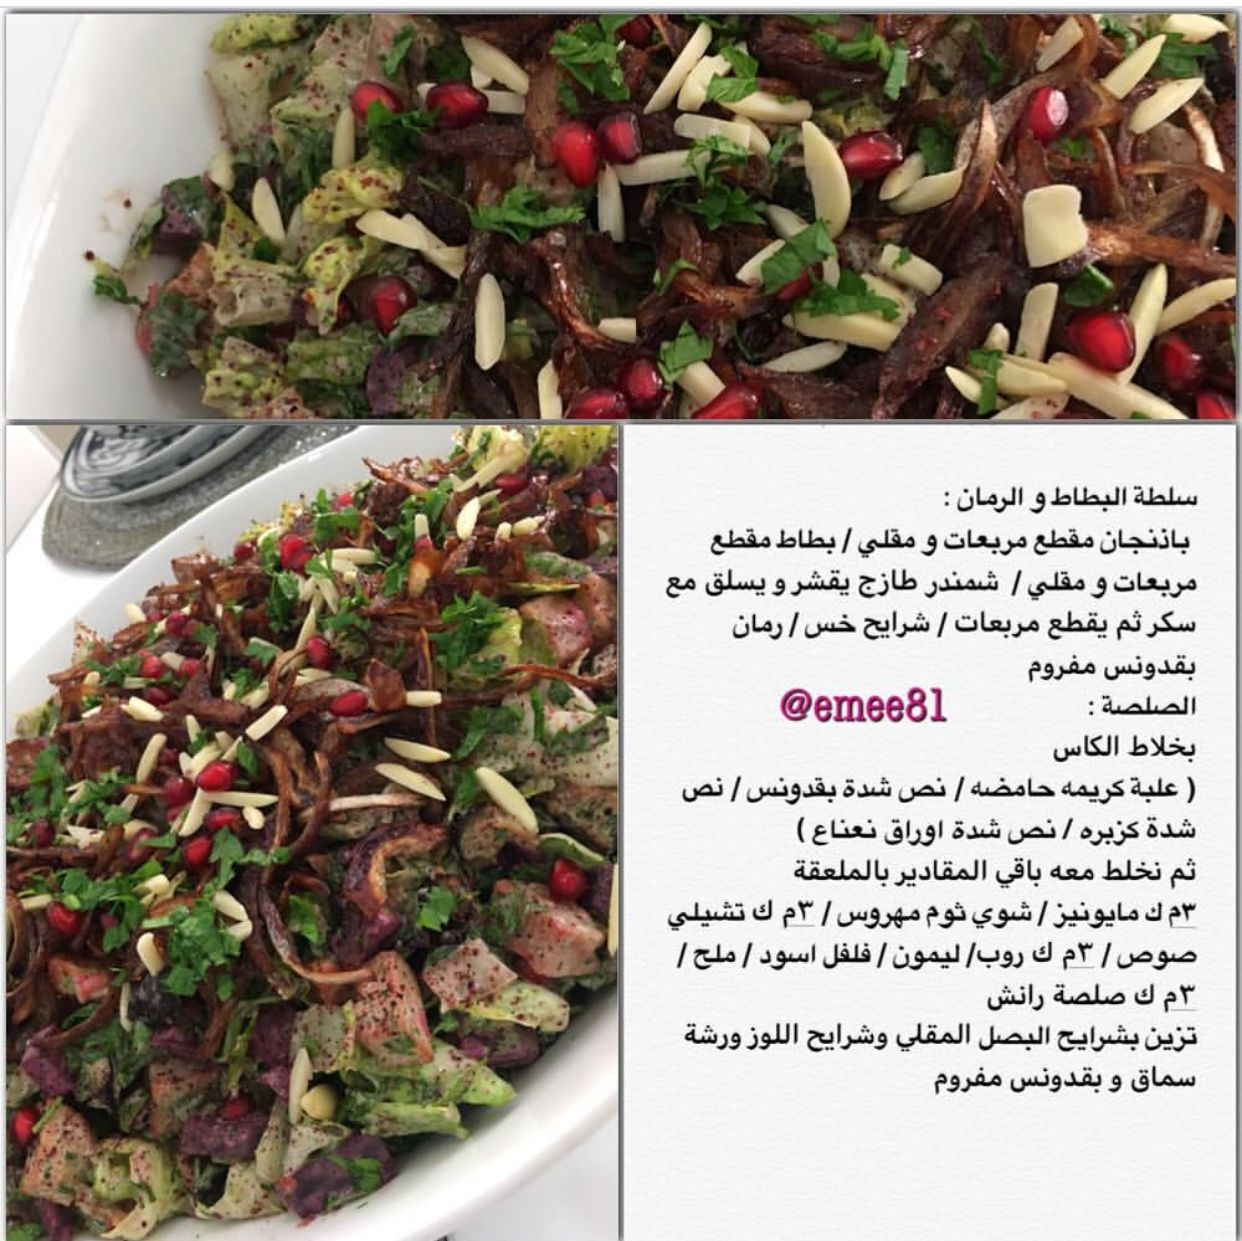 سلطة البطاط والباذنجان بدبس الرمان Cooking Recipes Salad Recipes Food Recipies